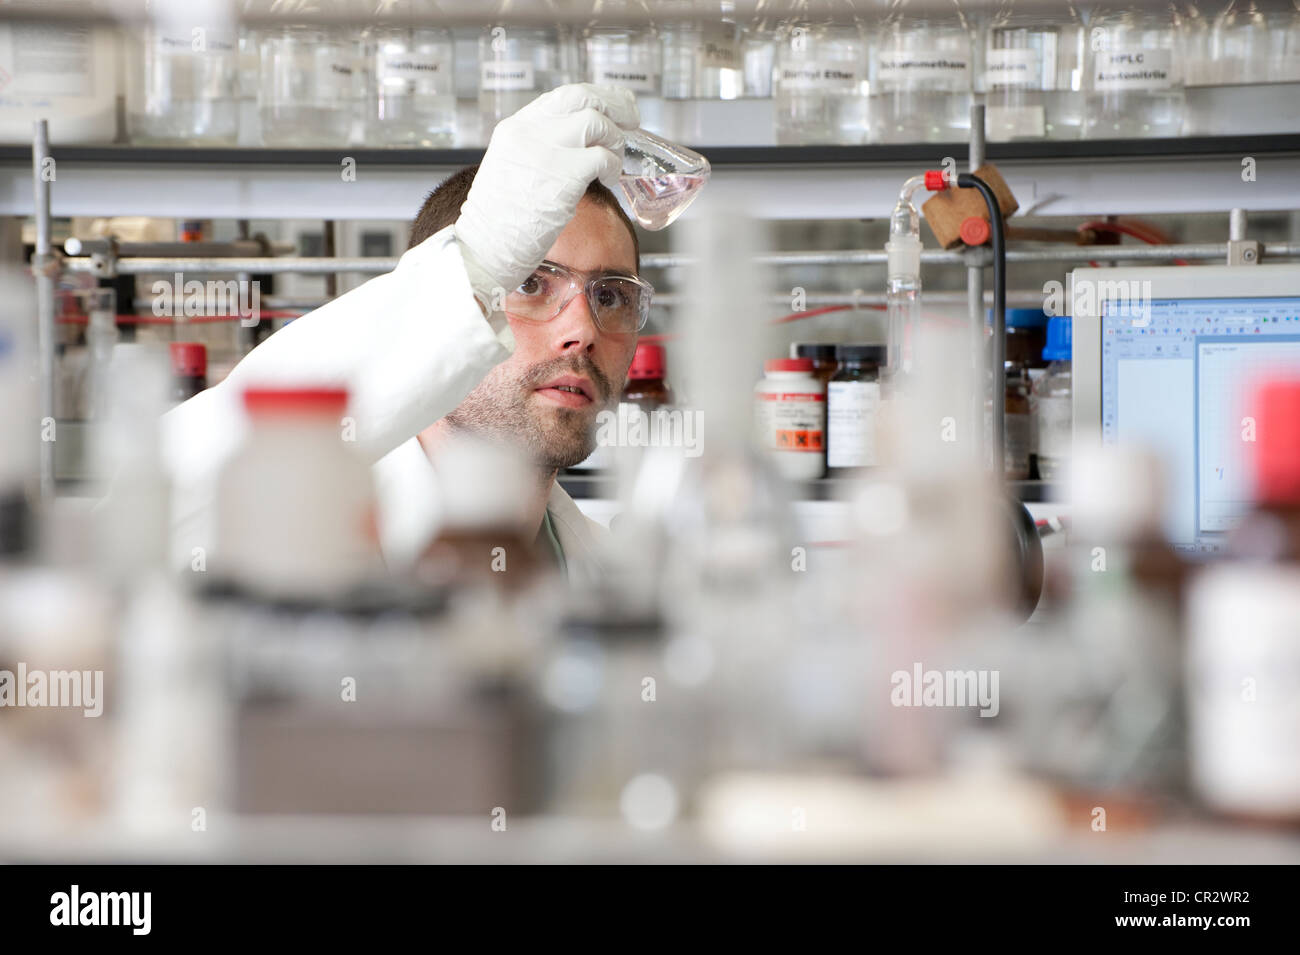 Labortechniker arbeiten im Labor Stockbild